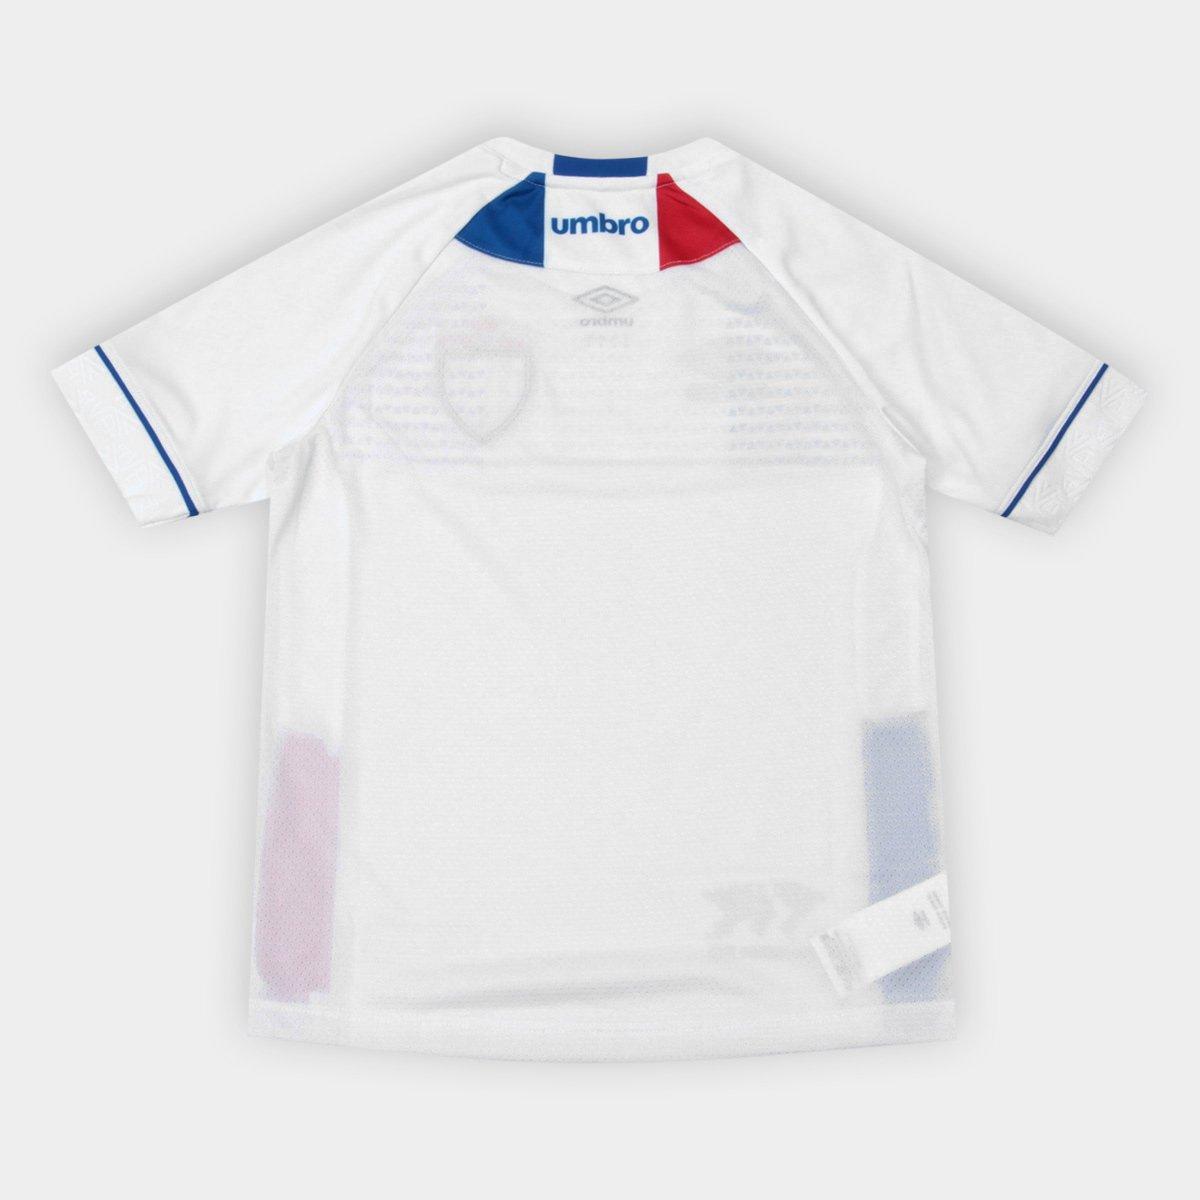 e 2018 Azul Torcedor Umbro Infantil Avaí II s Infantil Lion n° Branco Bleu Camisa taR7wqx